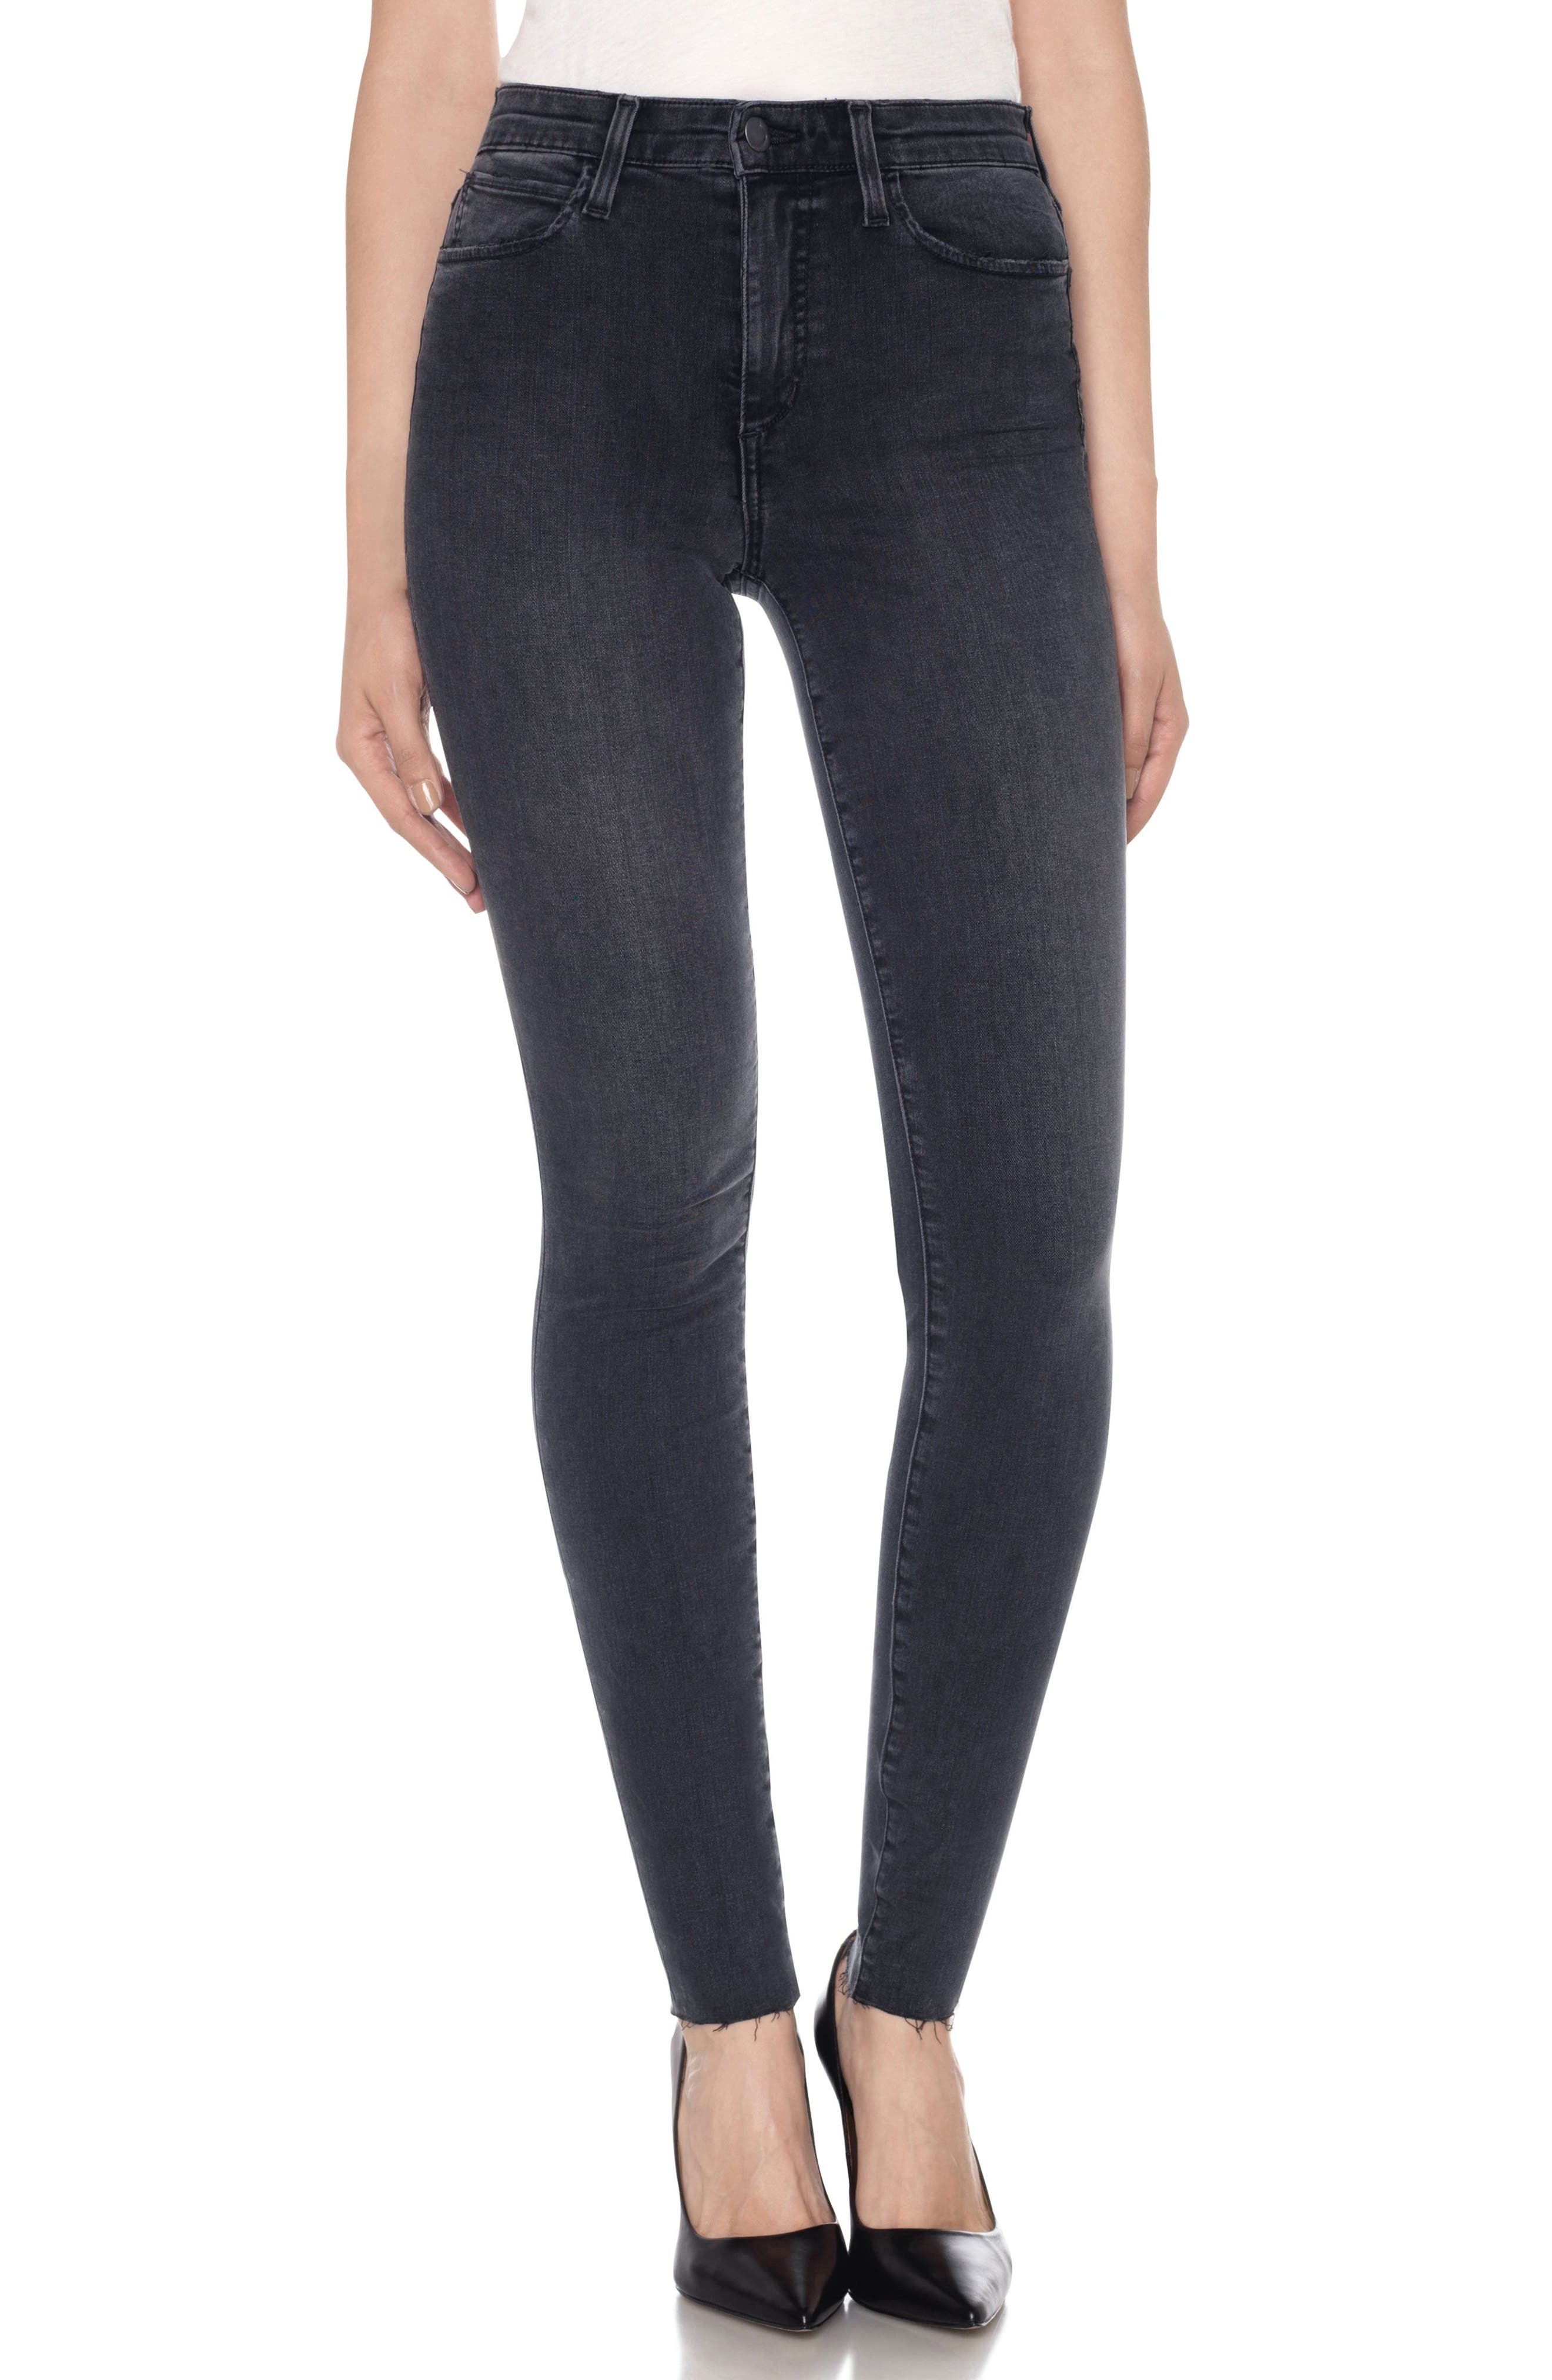 Main Image - Joe's Flawless - Charlie High Waist Skinny Jeans (Ilana)